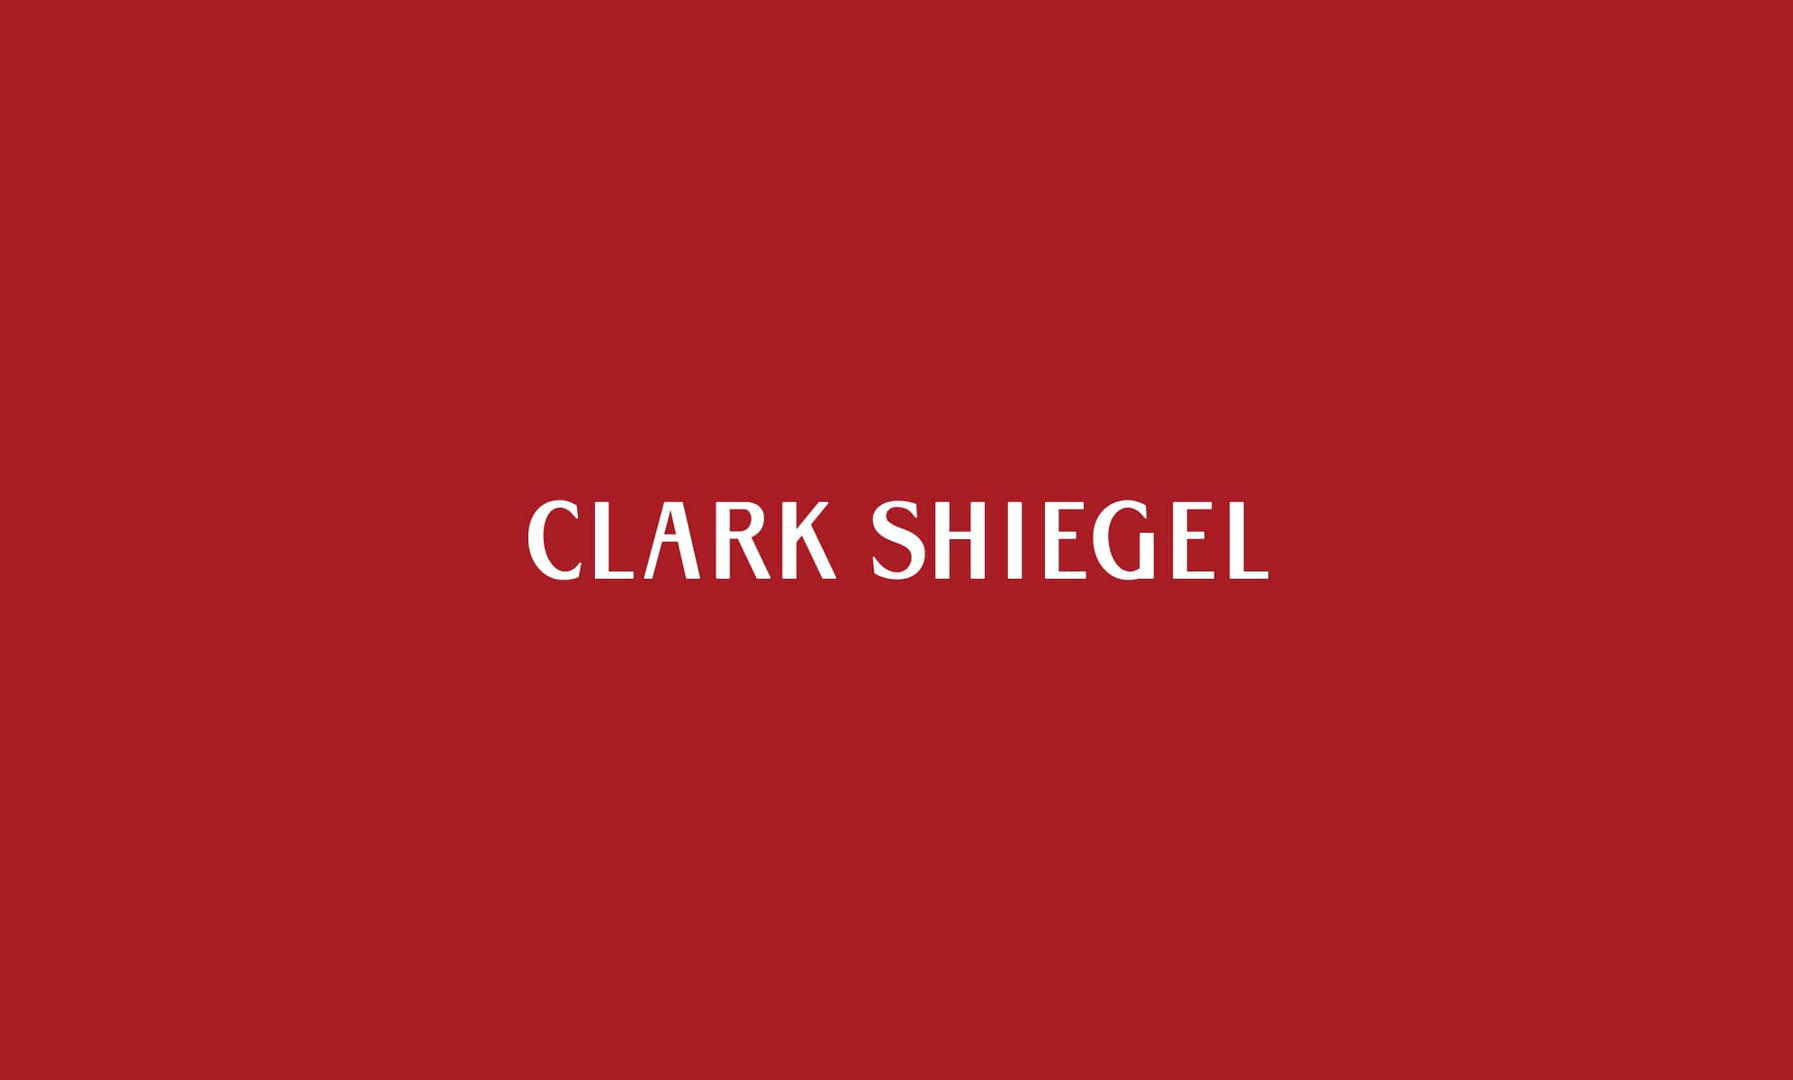 CLARK SHIEGEL